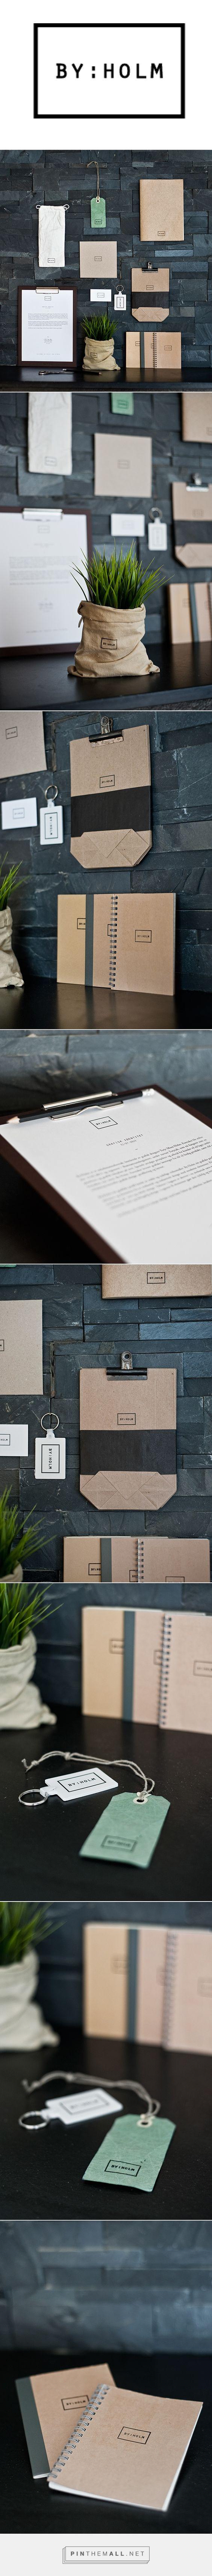 By:Holm Identity on Behance   Fivestar Branding – Design and Branding Agency & Inspiration Gallery